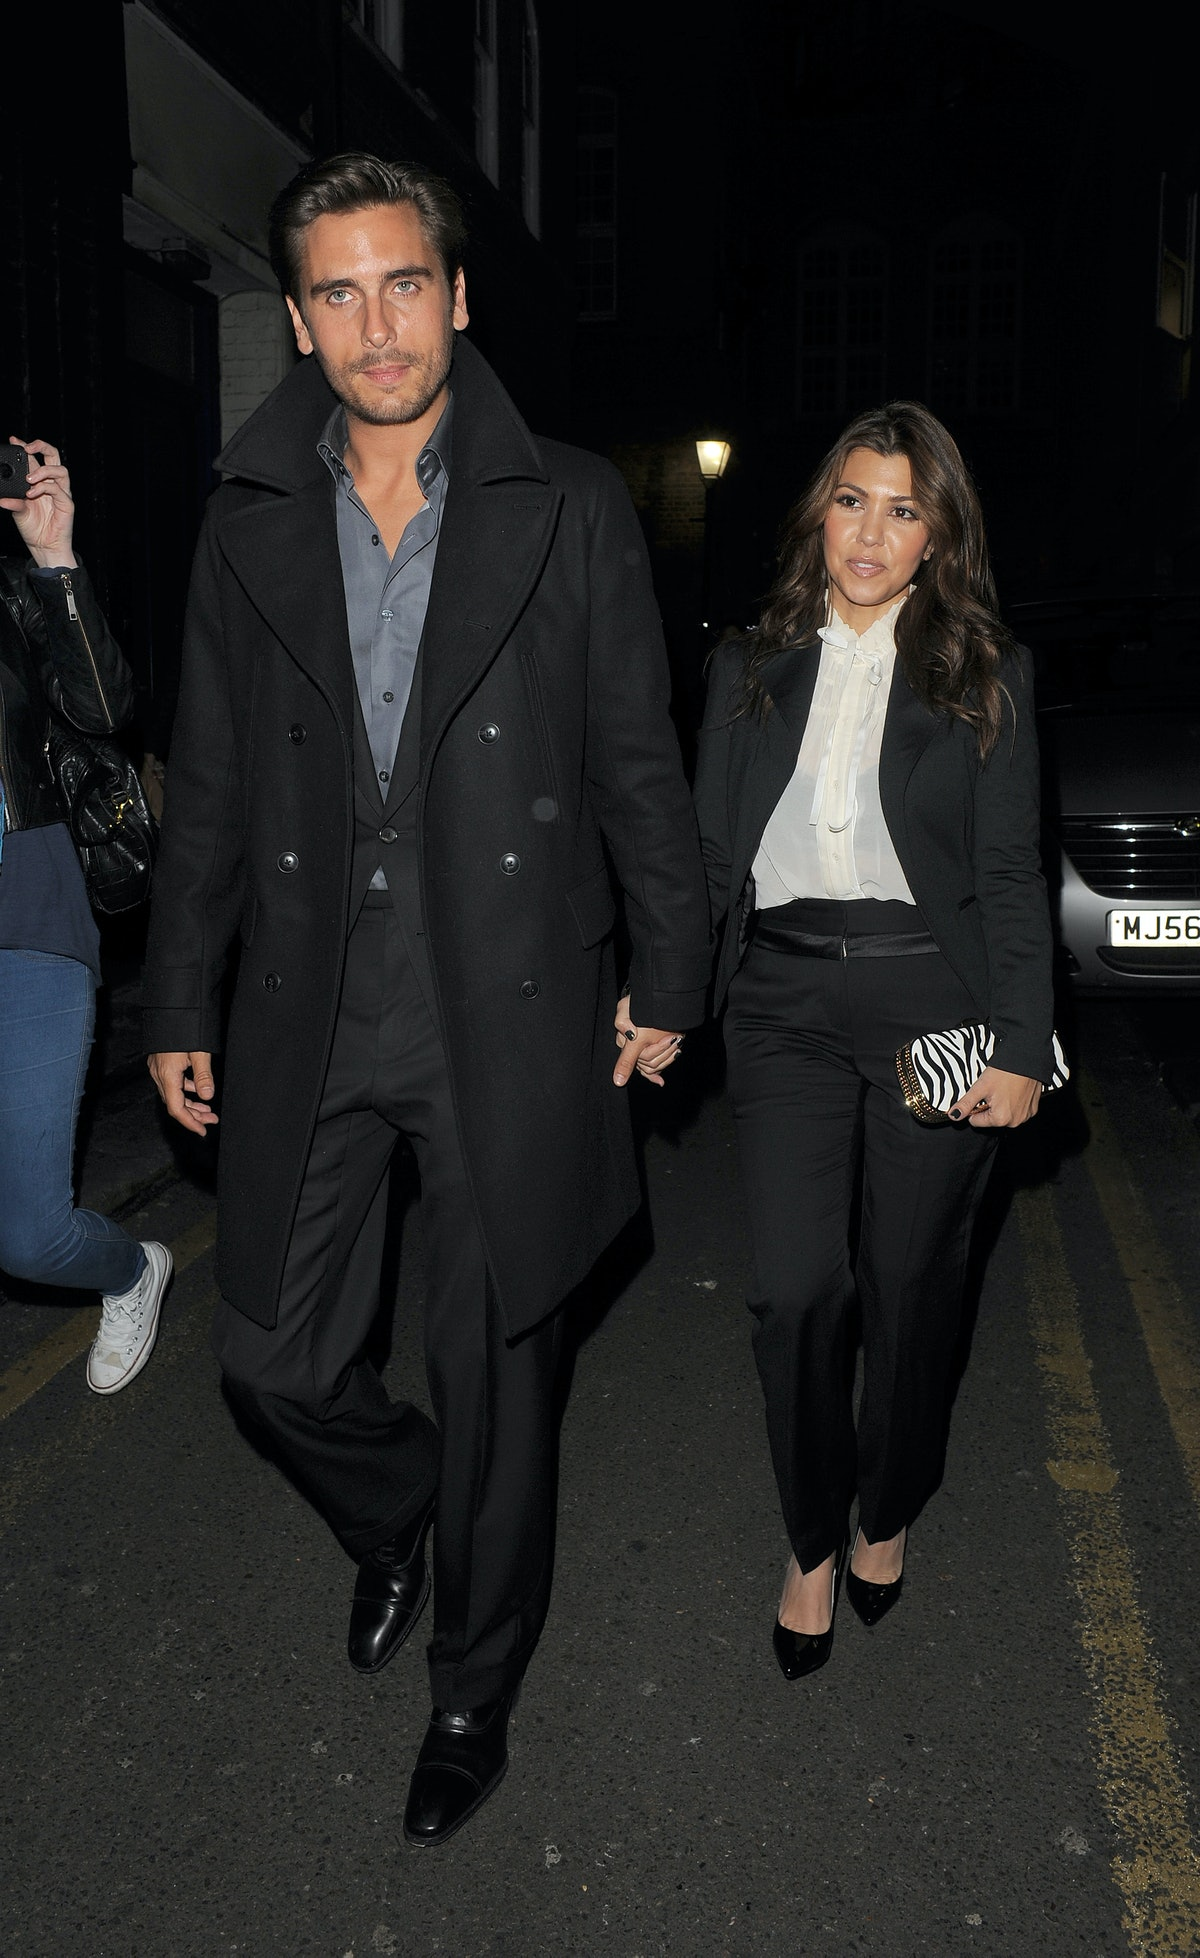 LONDON, ENGLAND - NOVEMBER 10: Scott Disick and Kourtney Kardashian leave Hakkasan restaurant on Tottenham Court Road on November 10, 2012 in London, England. (Photo by Will/GC Images)